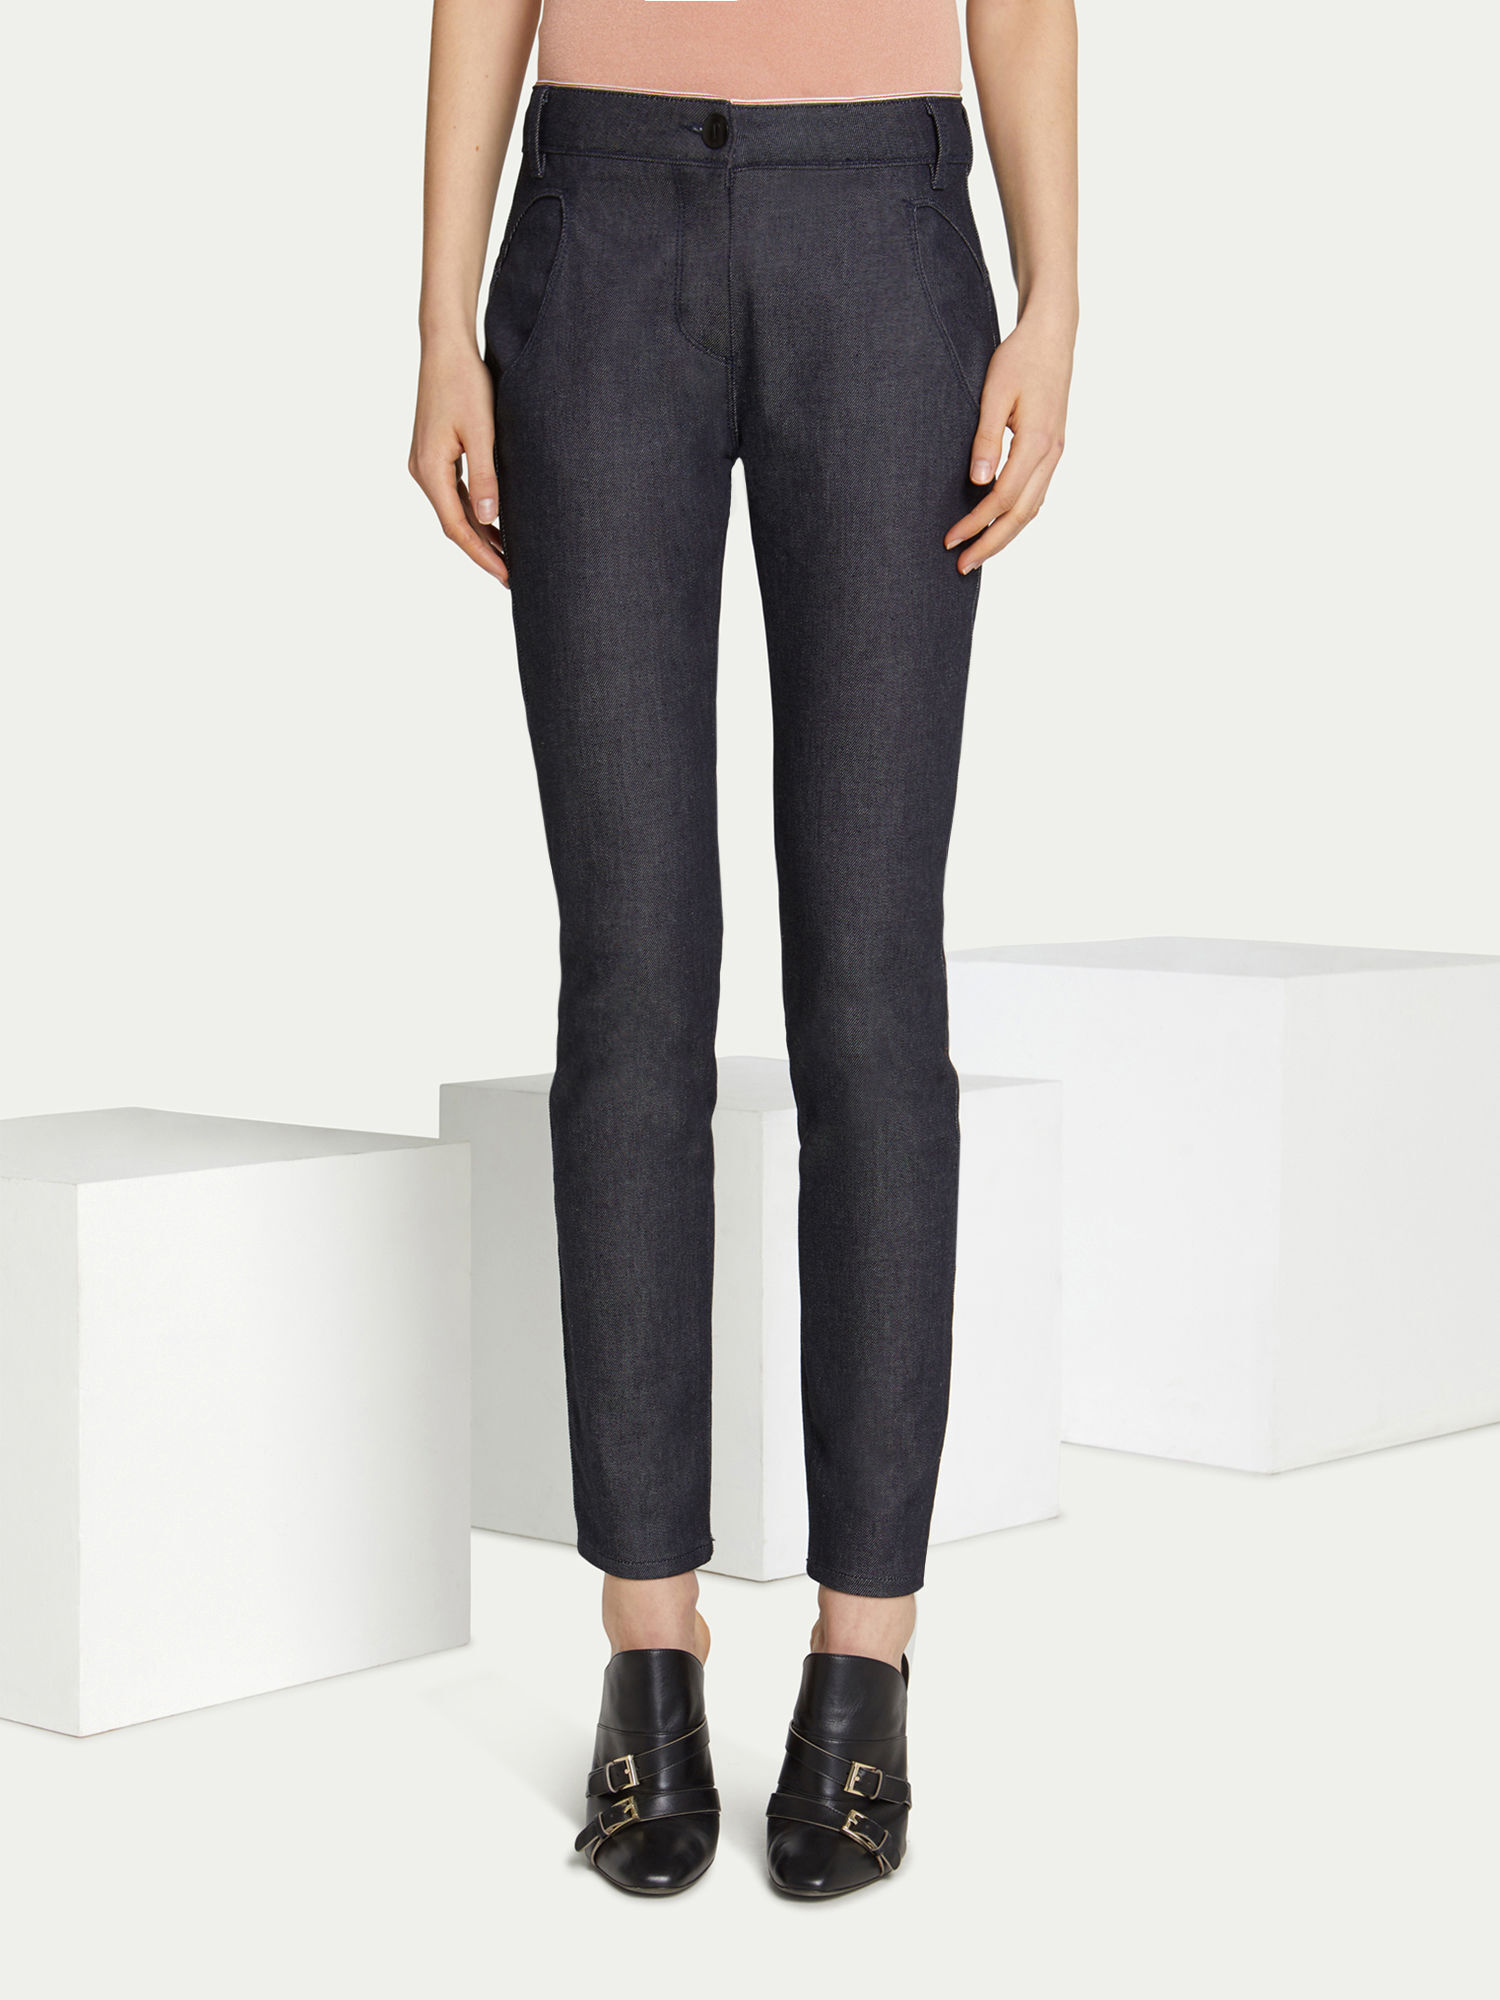 Skinner Skinner Alta Vita Donna Jeans Jeans nwP0OkX8